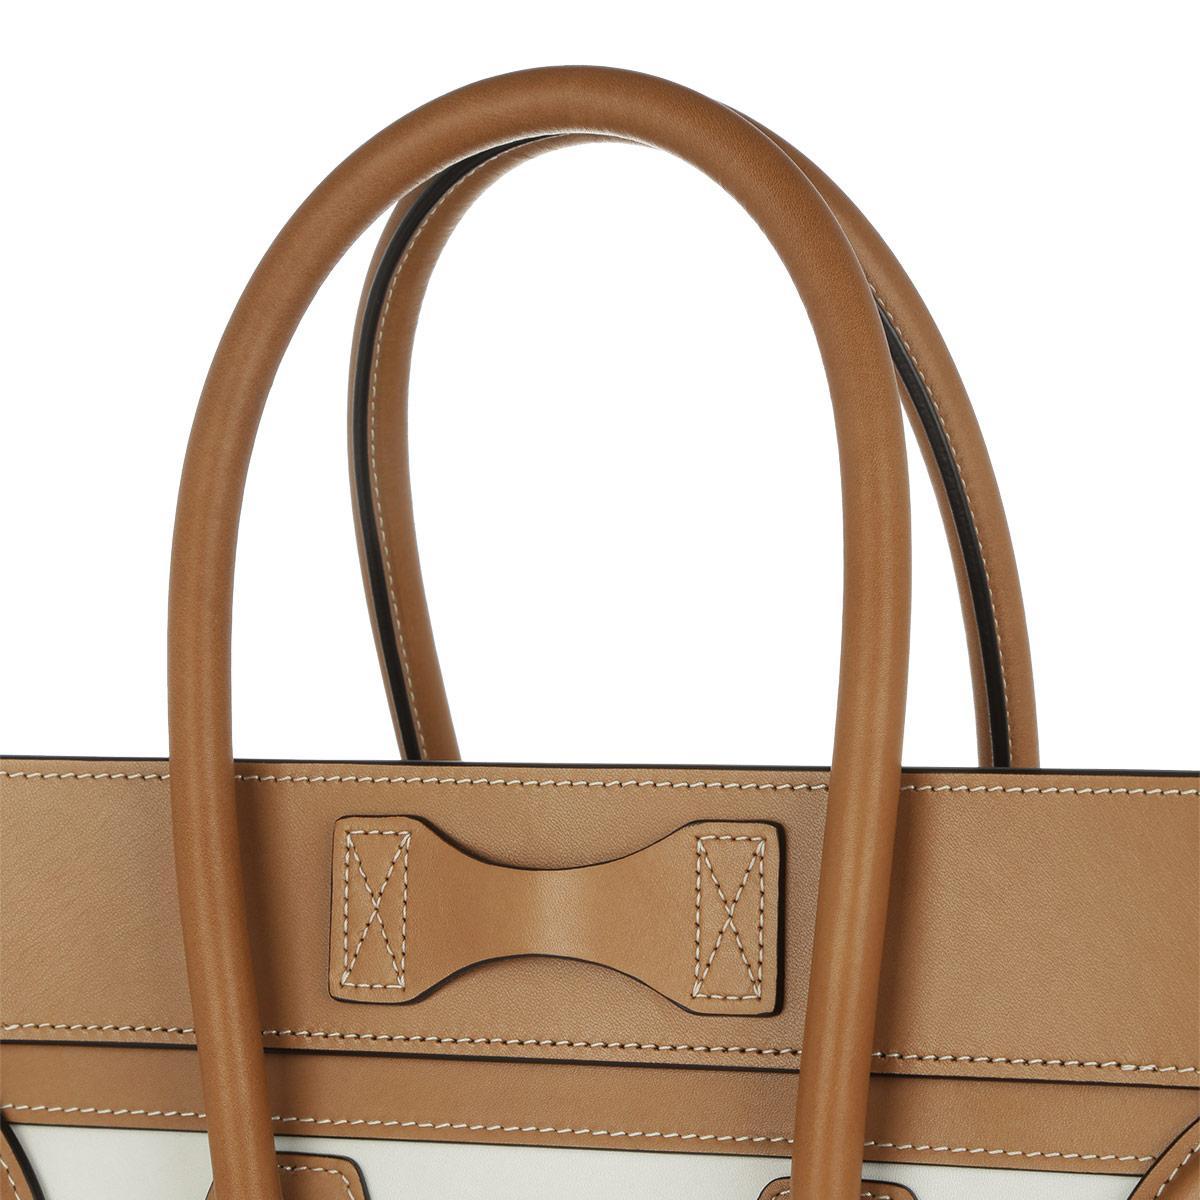 Celine Leather Luggage Tote Multicolor Micro Nude